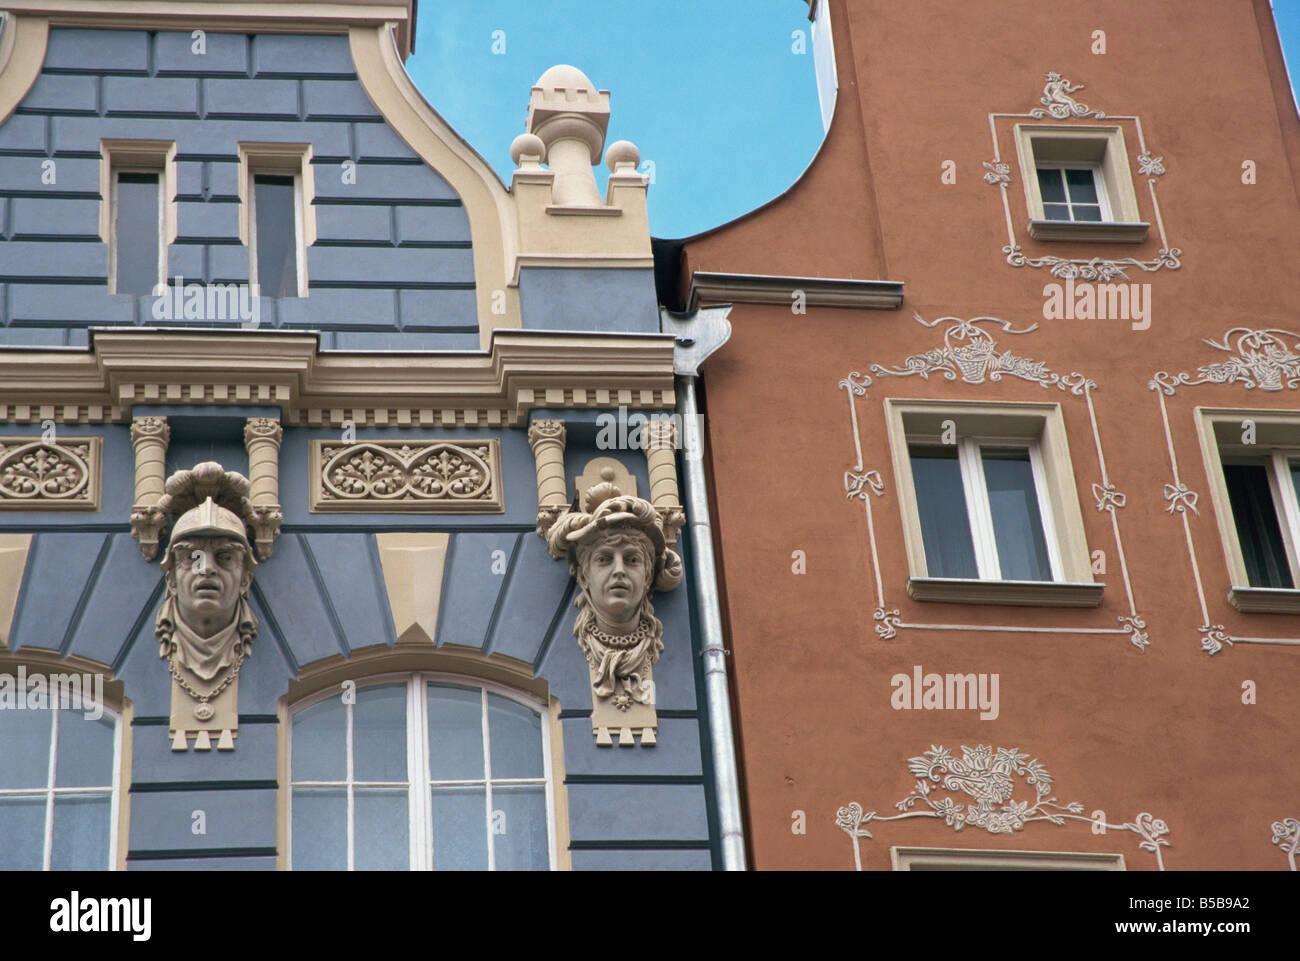 Gables Dtugi Gdansk Pomerania Poland Europe - Stock Image